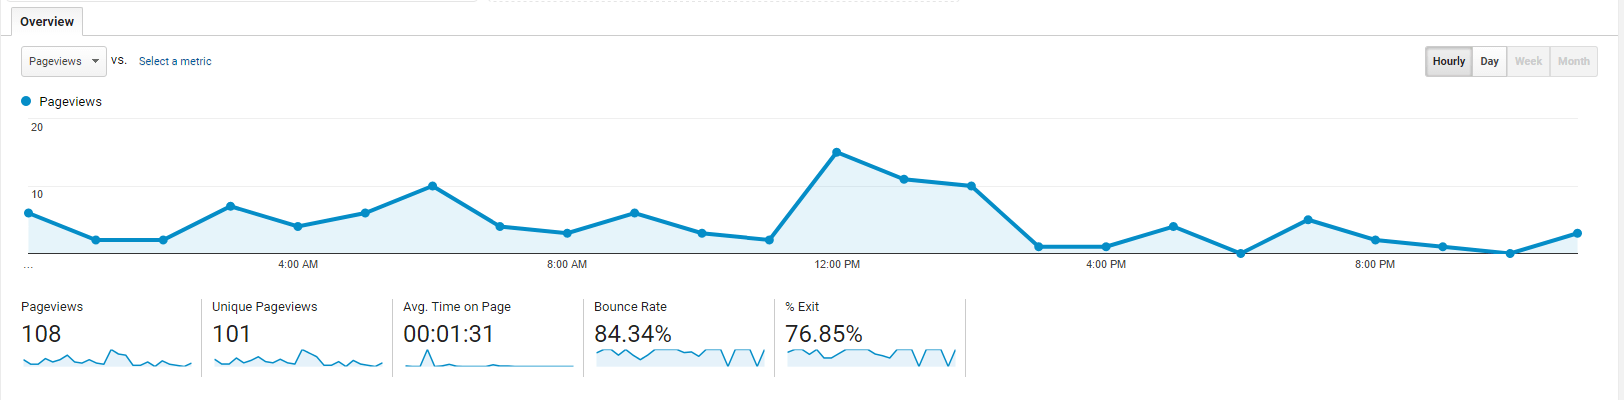 google-analytics-pageviews-metrics-codeless